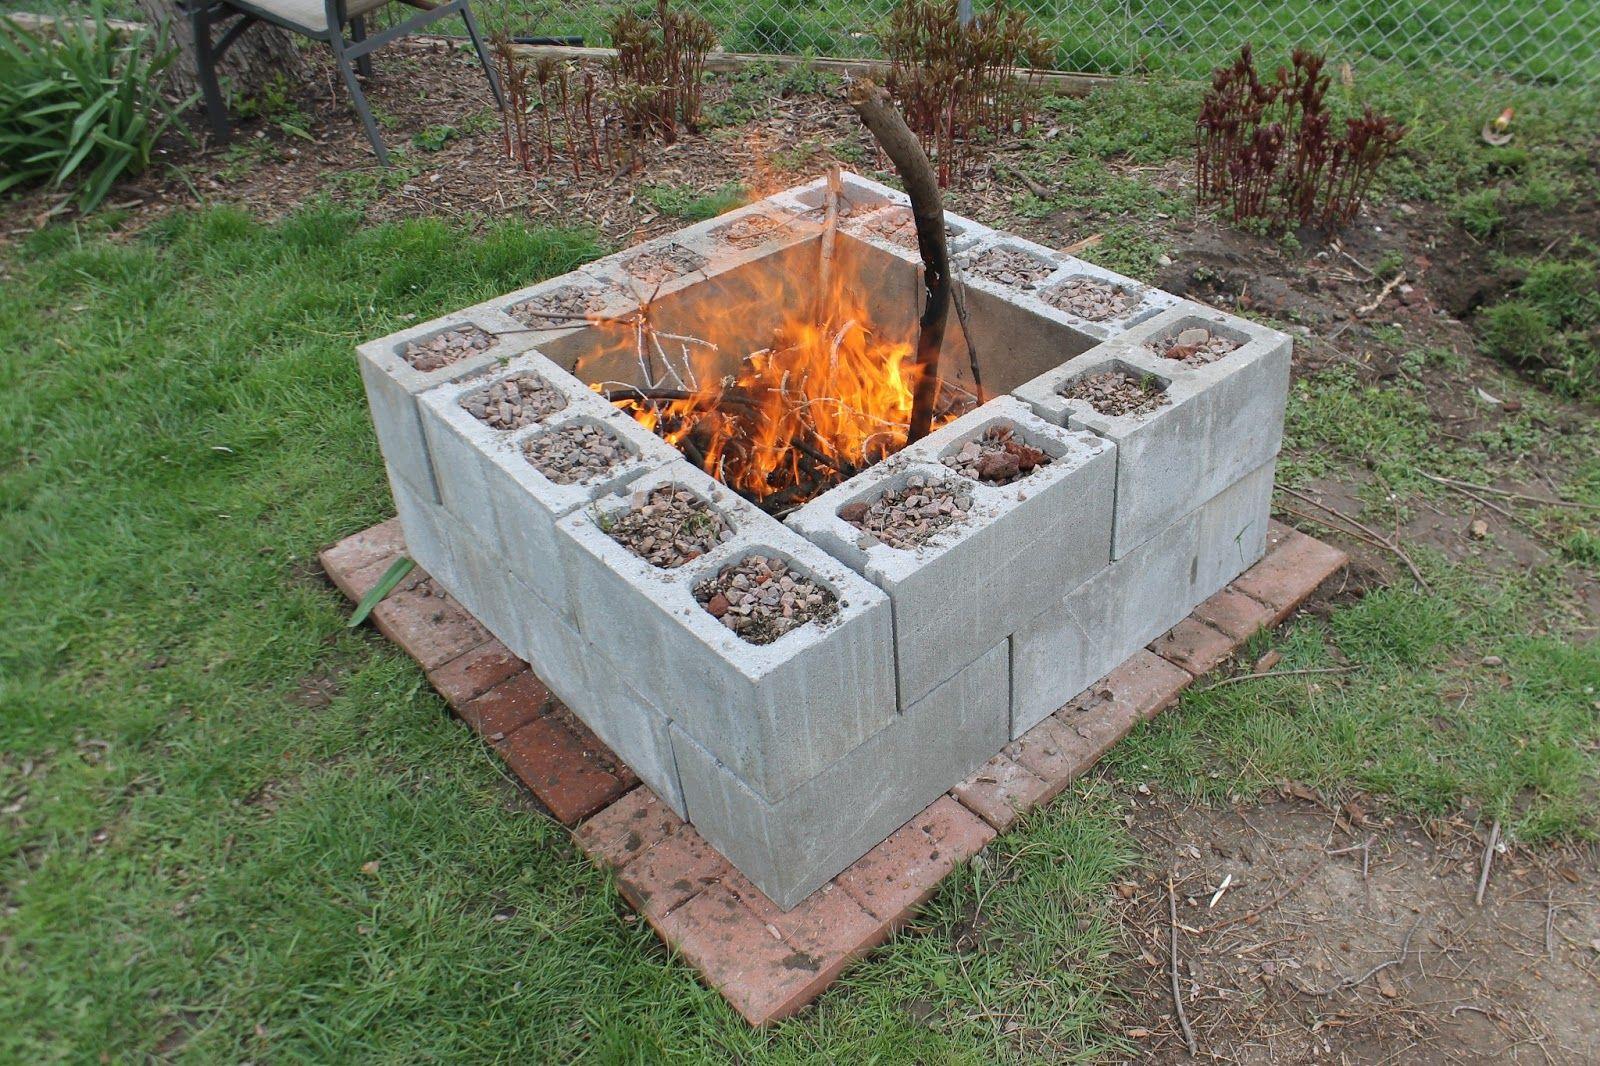 17 DIY Fire Pit Ideas for Your Backyard | Pinterest | Diy ...